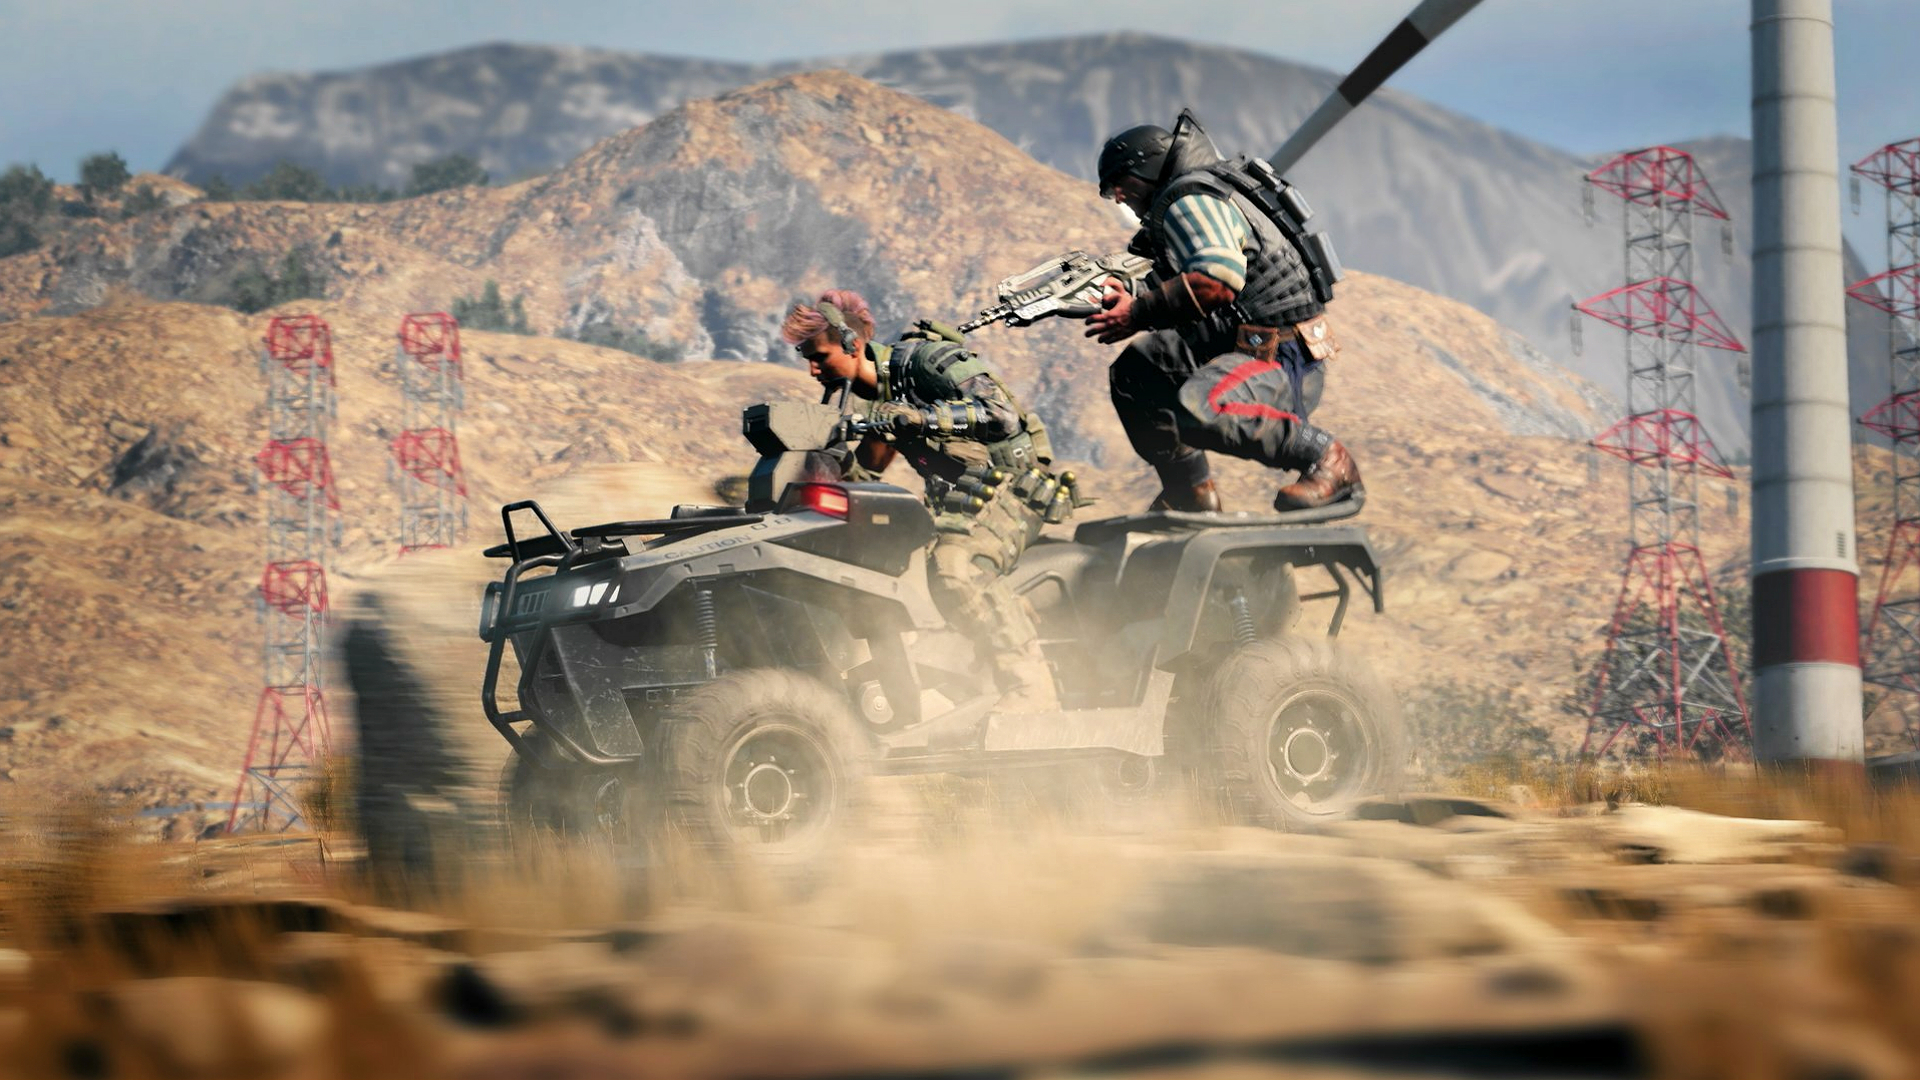 Black Ops 4's Blackout has splitscreen – but not for PC